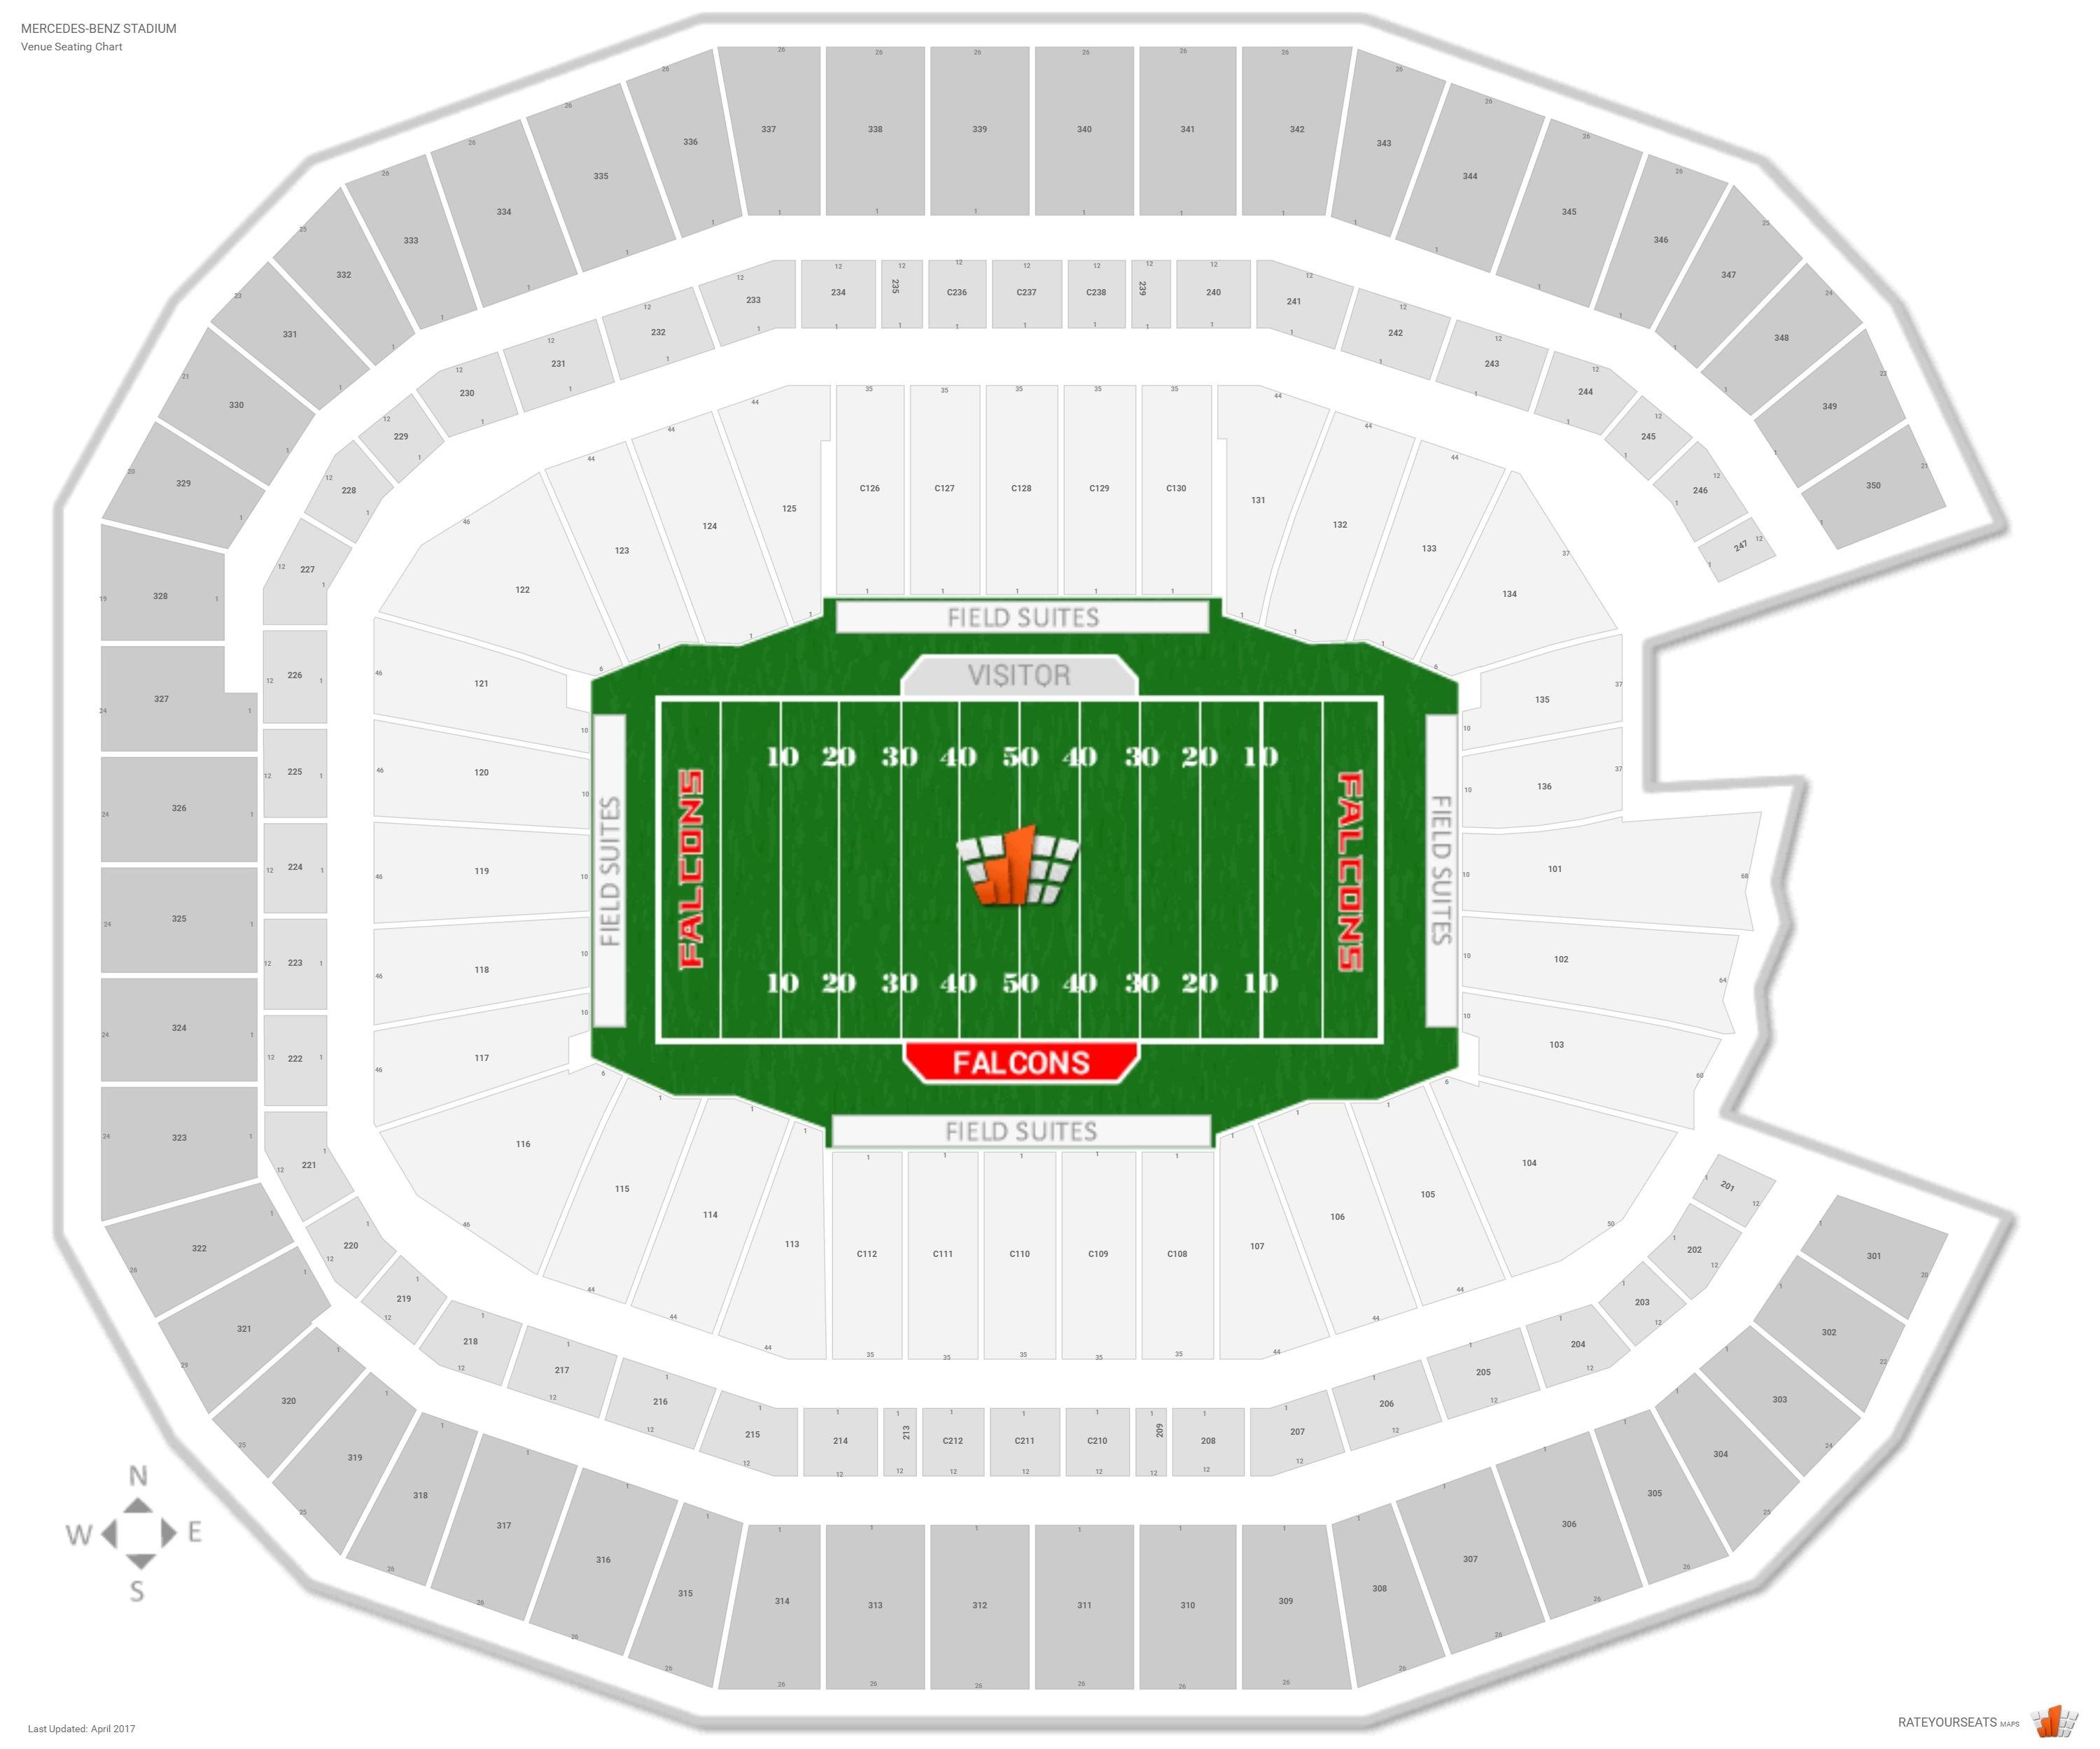 Atlanta Falcons Seating Guide - Mercedes-Benz Stadium with Atlanta Super Bowl Stadium Seating Chart